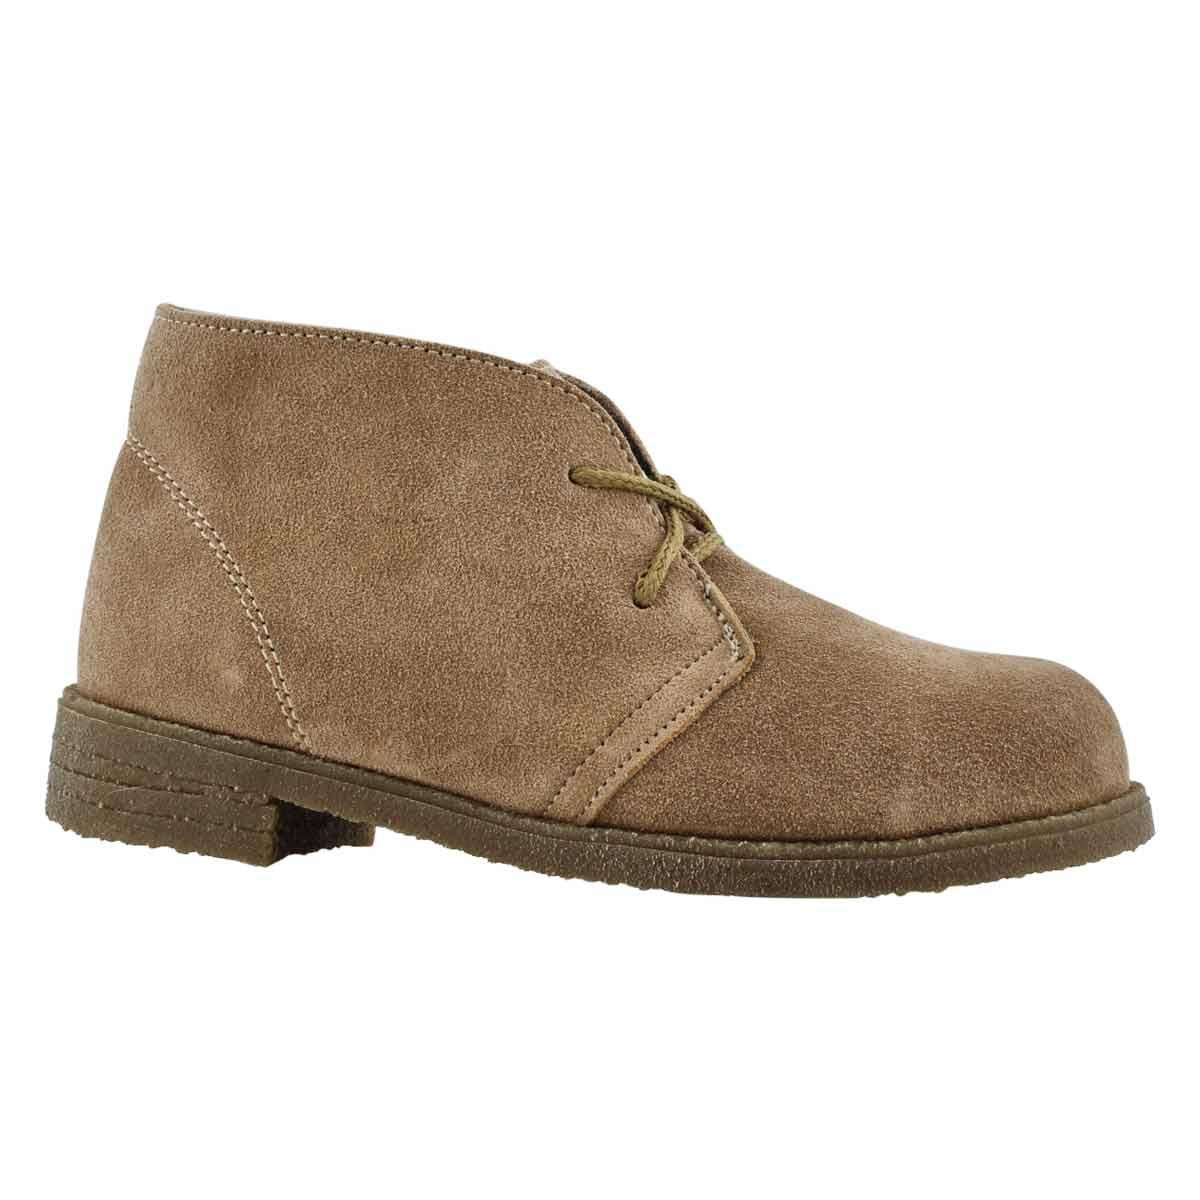 Lds Dessy beige CSA chukka boot